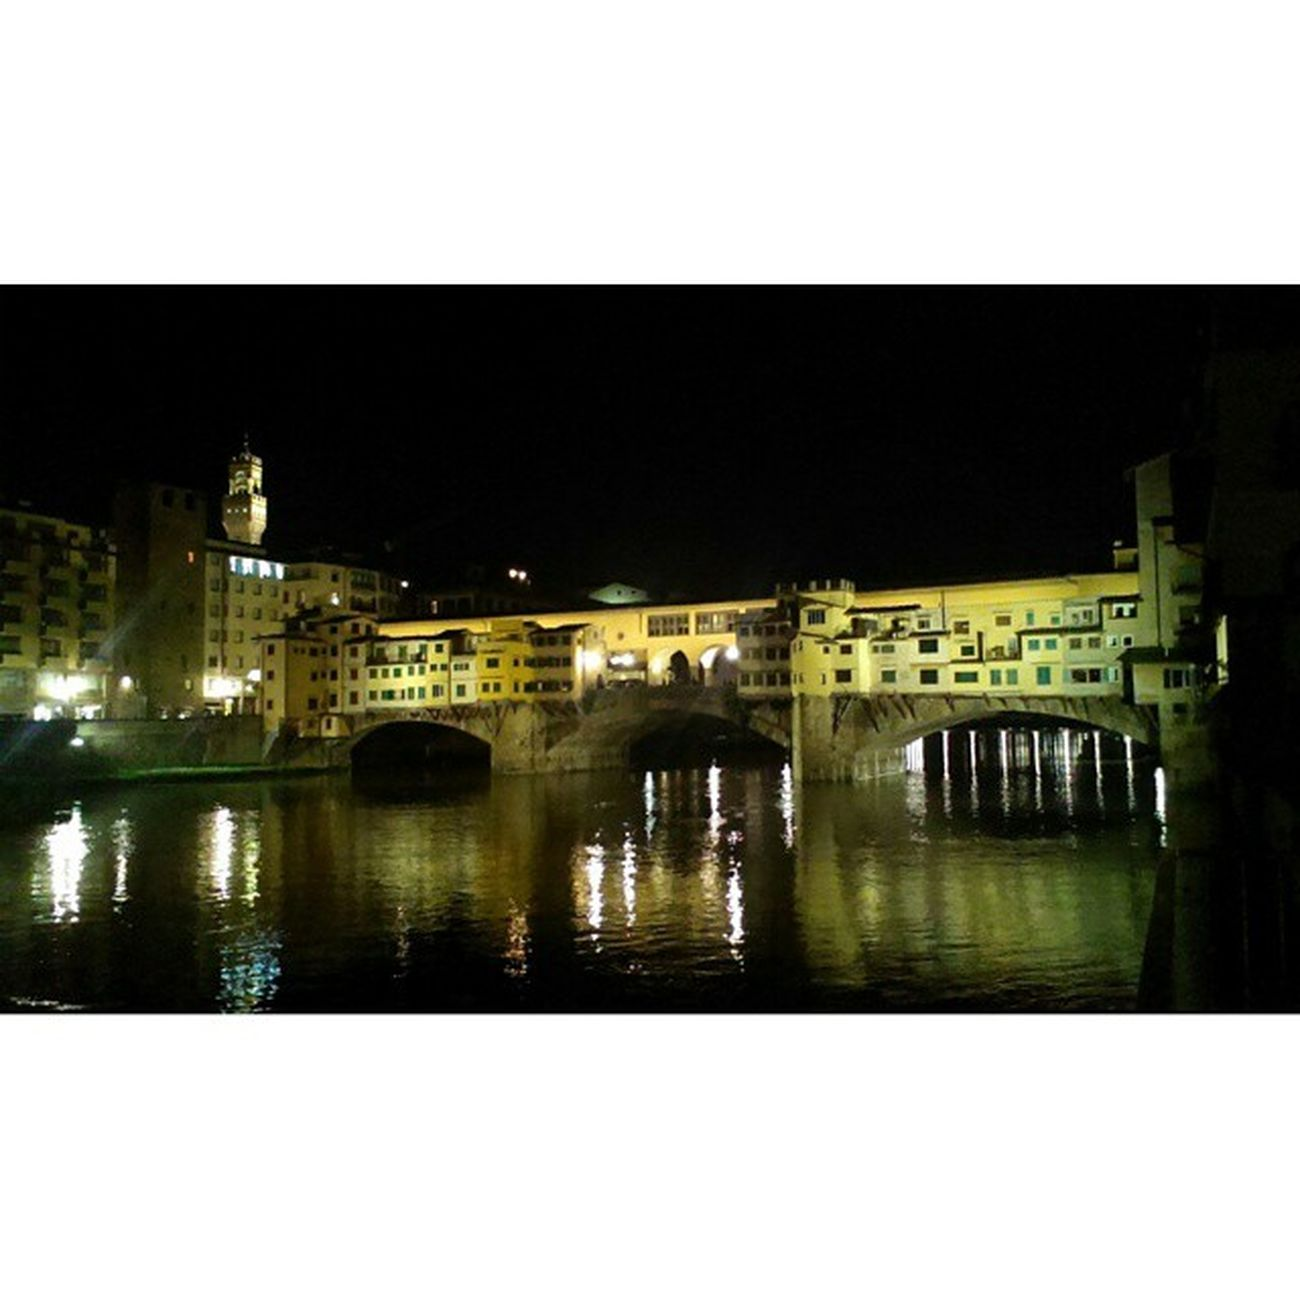 Firenze Pontevecchio Fiumearno Igersfirenze arno toscana tuscany torrediarnolfo palazzovecchio architettura architecture vscotuscanyvsco vscocam art arte rinascimento